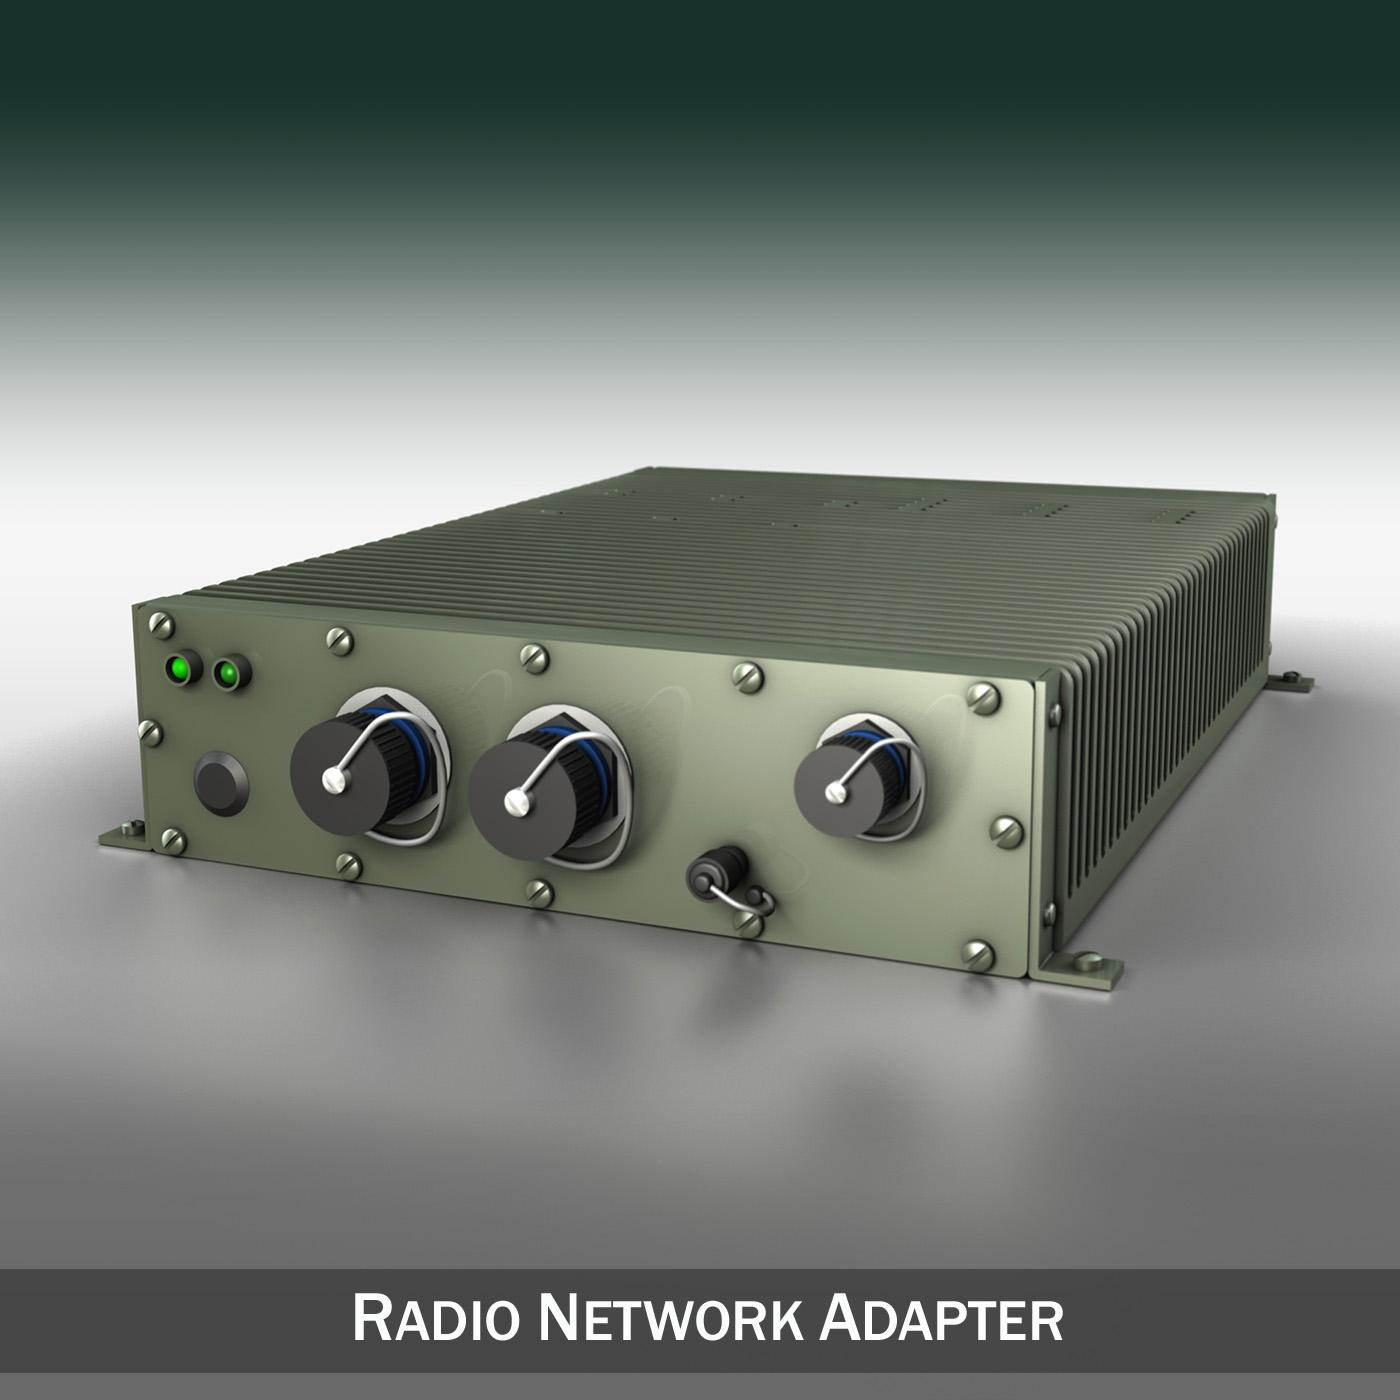 Radio network adapter 3d model 3ds fbx c4d lwo lws lw obj 189305